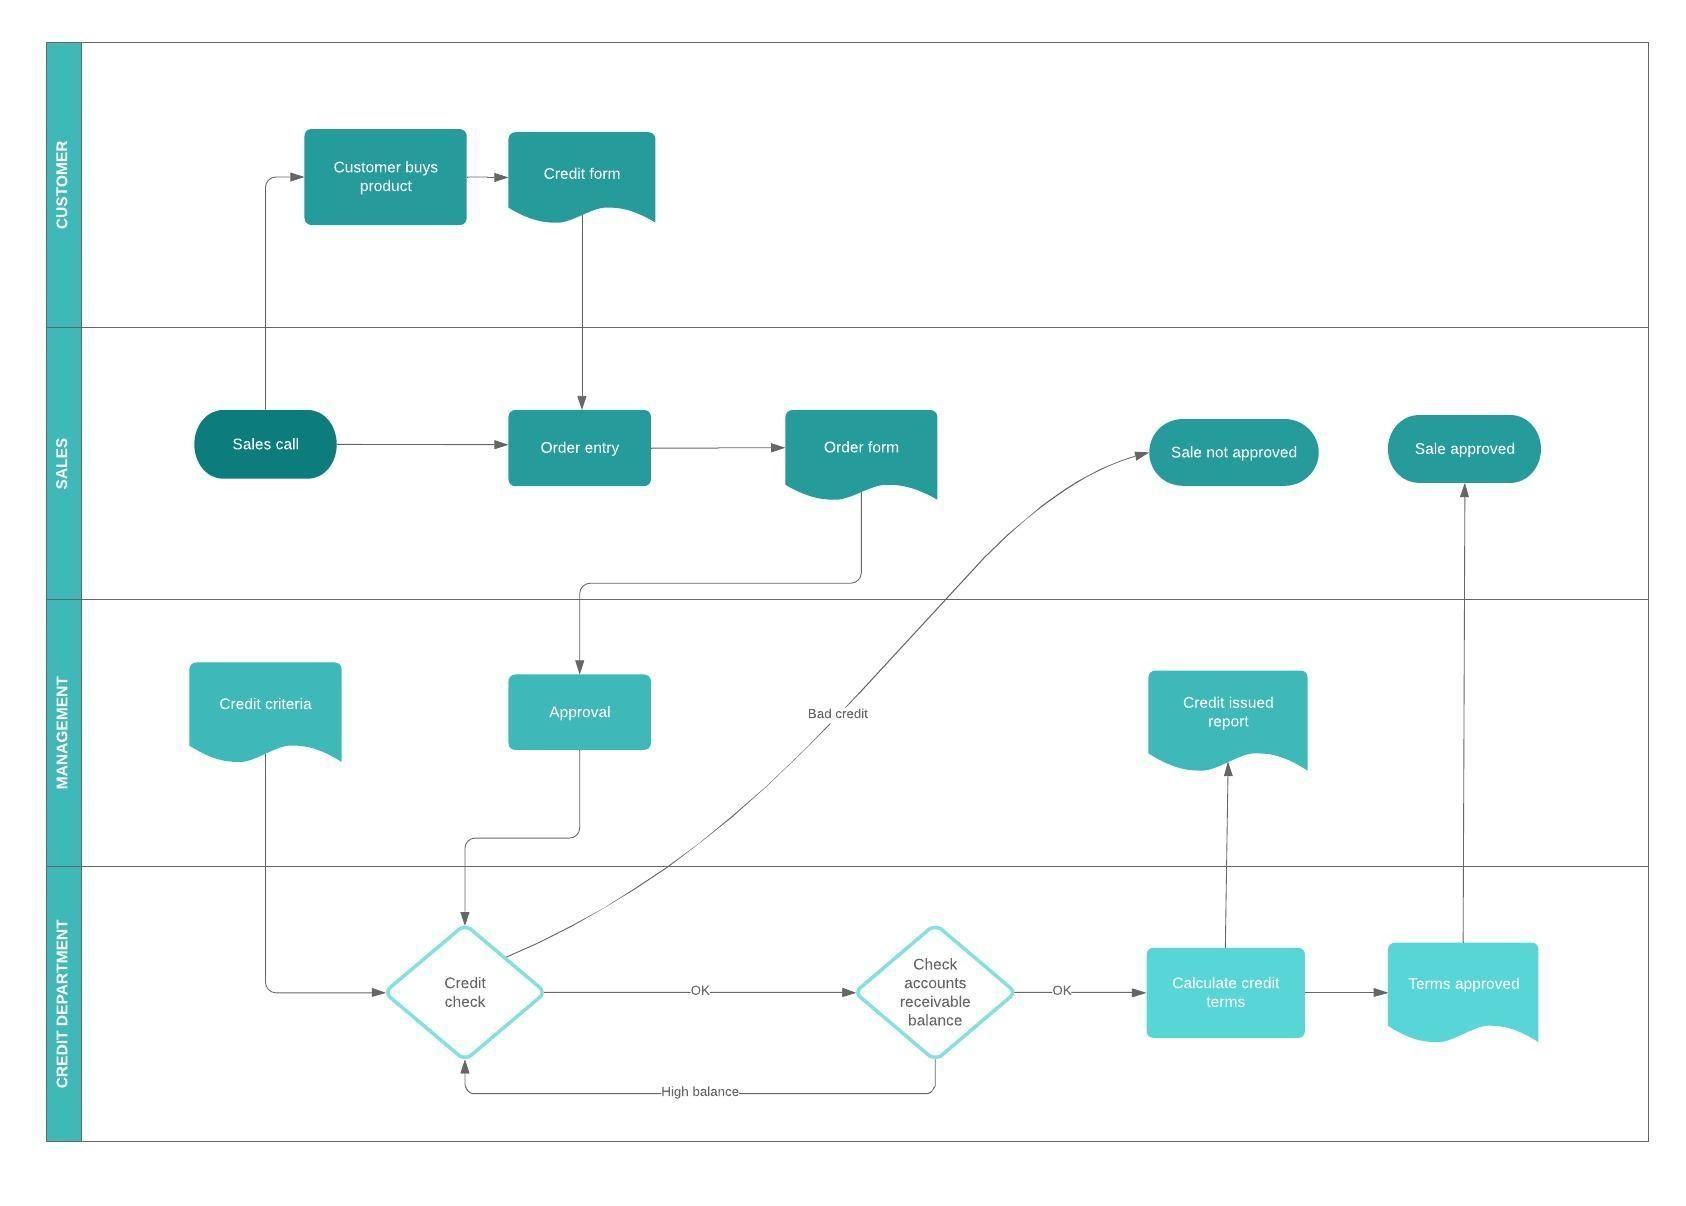 002 Surprising Free Flow Chart Template High Resolution  Word PrintableFull